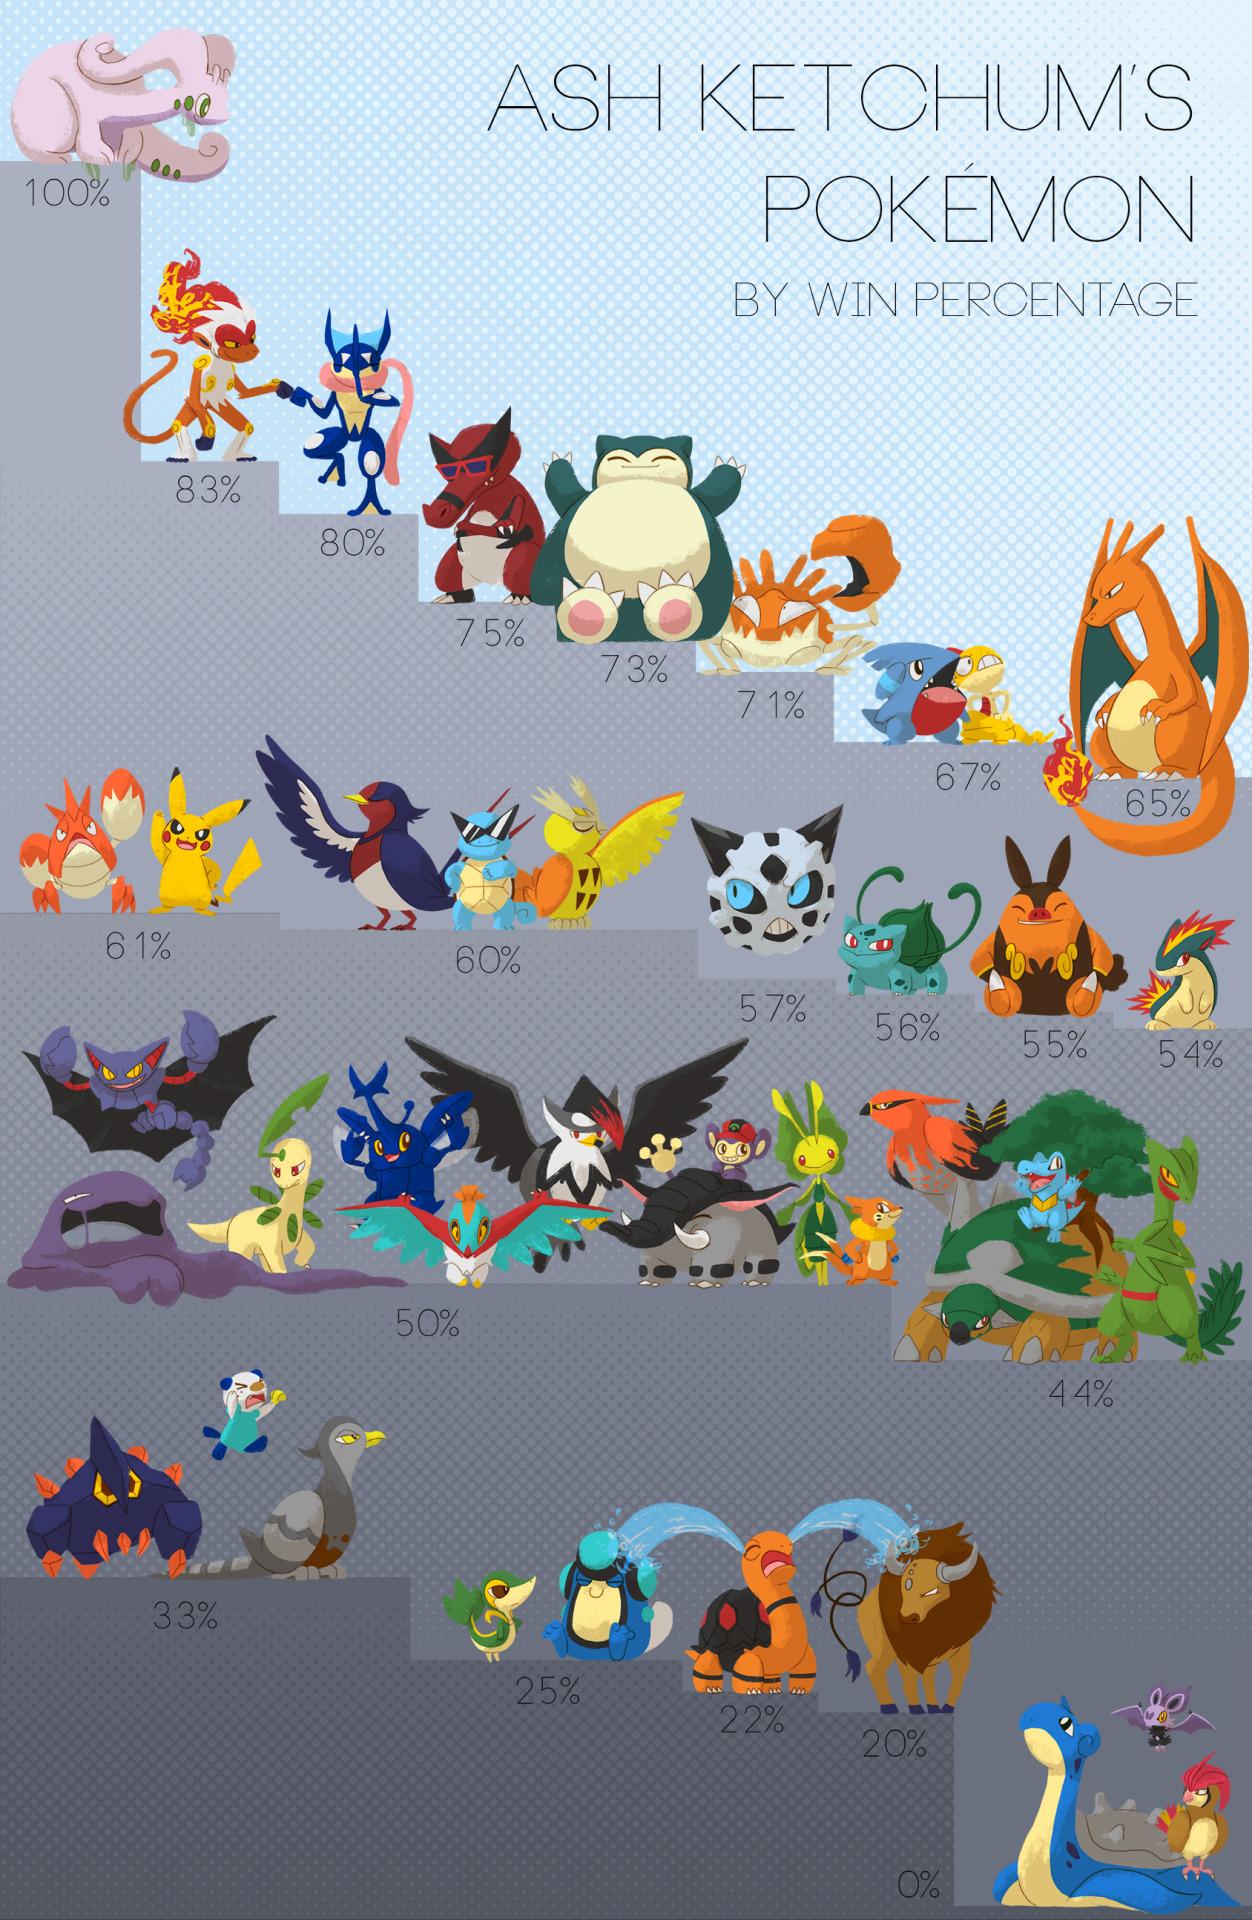 Ash's Pokemon ranking by Win Percentage | Pokémon | Know Your Meme